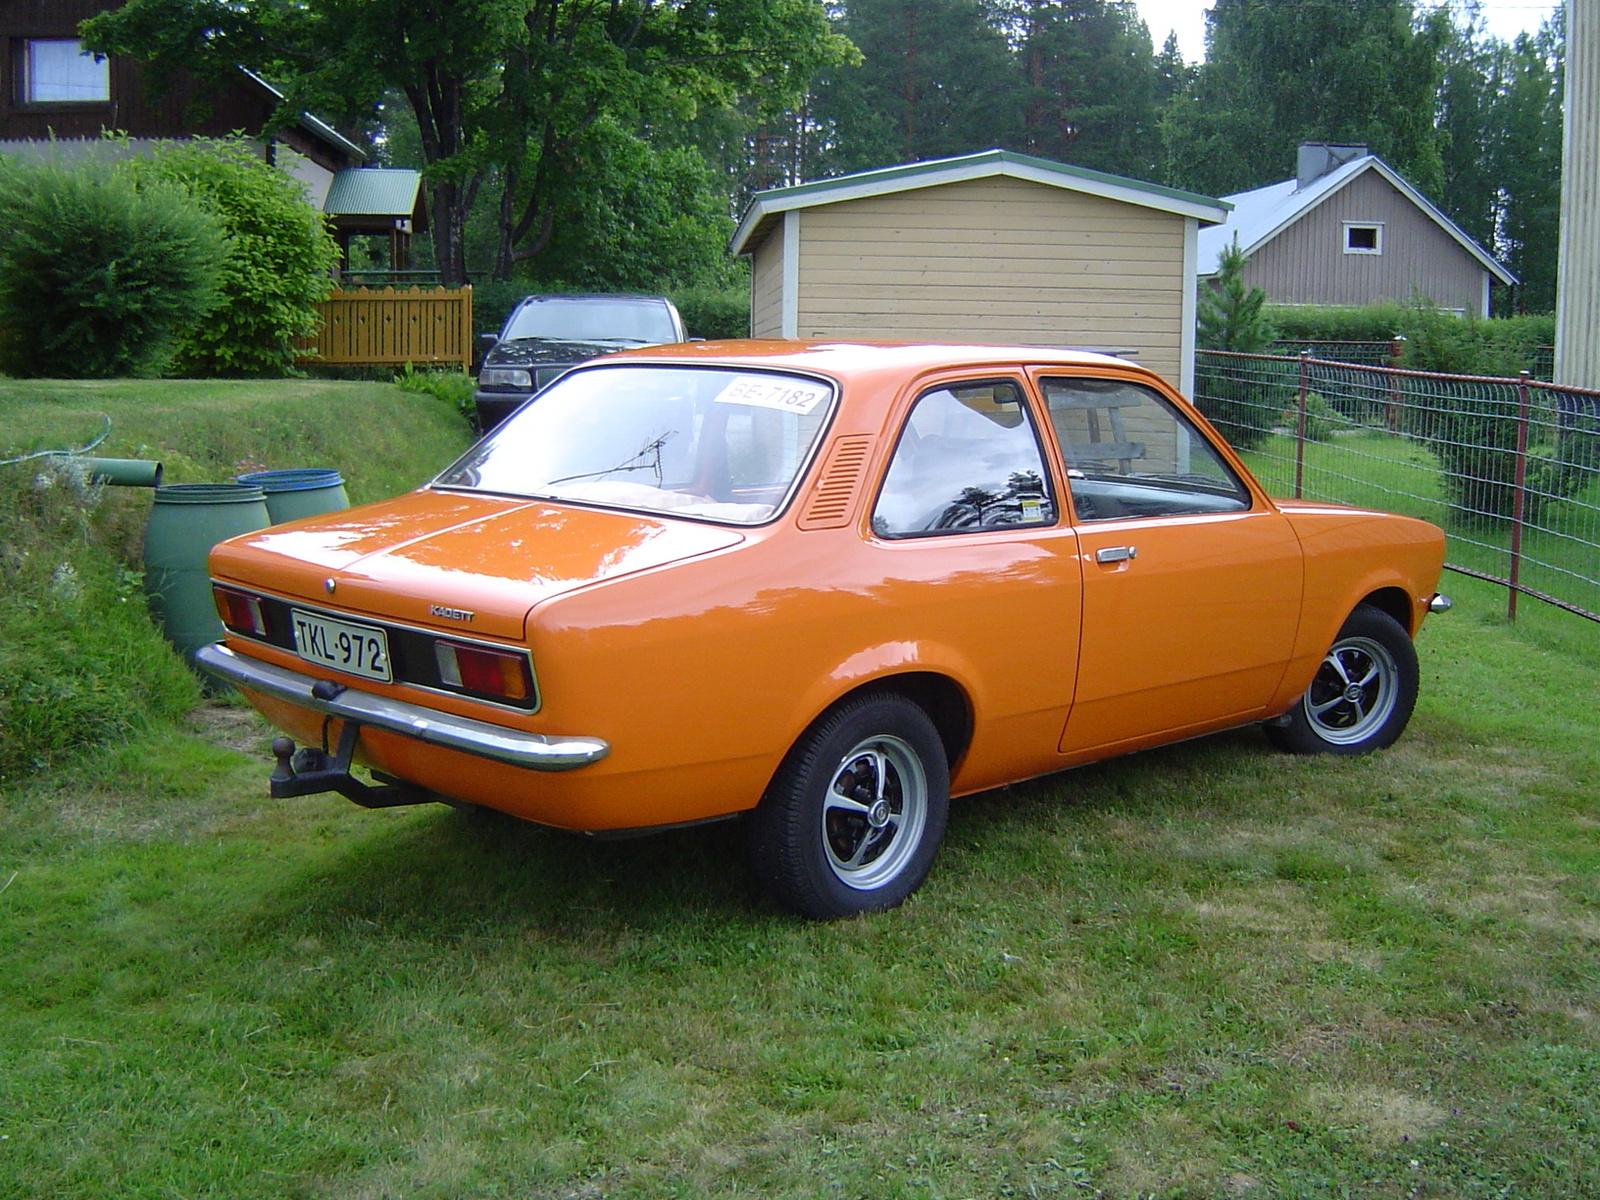 1977 Opel Kadett picture, exterior